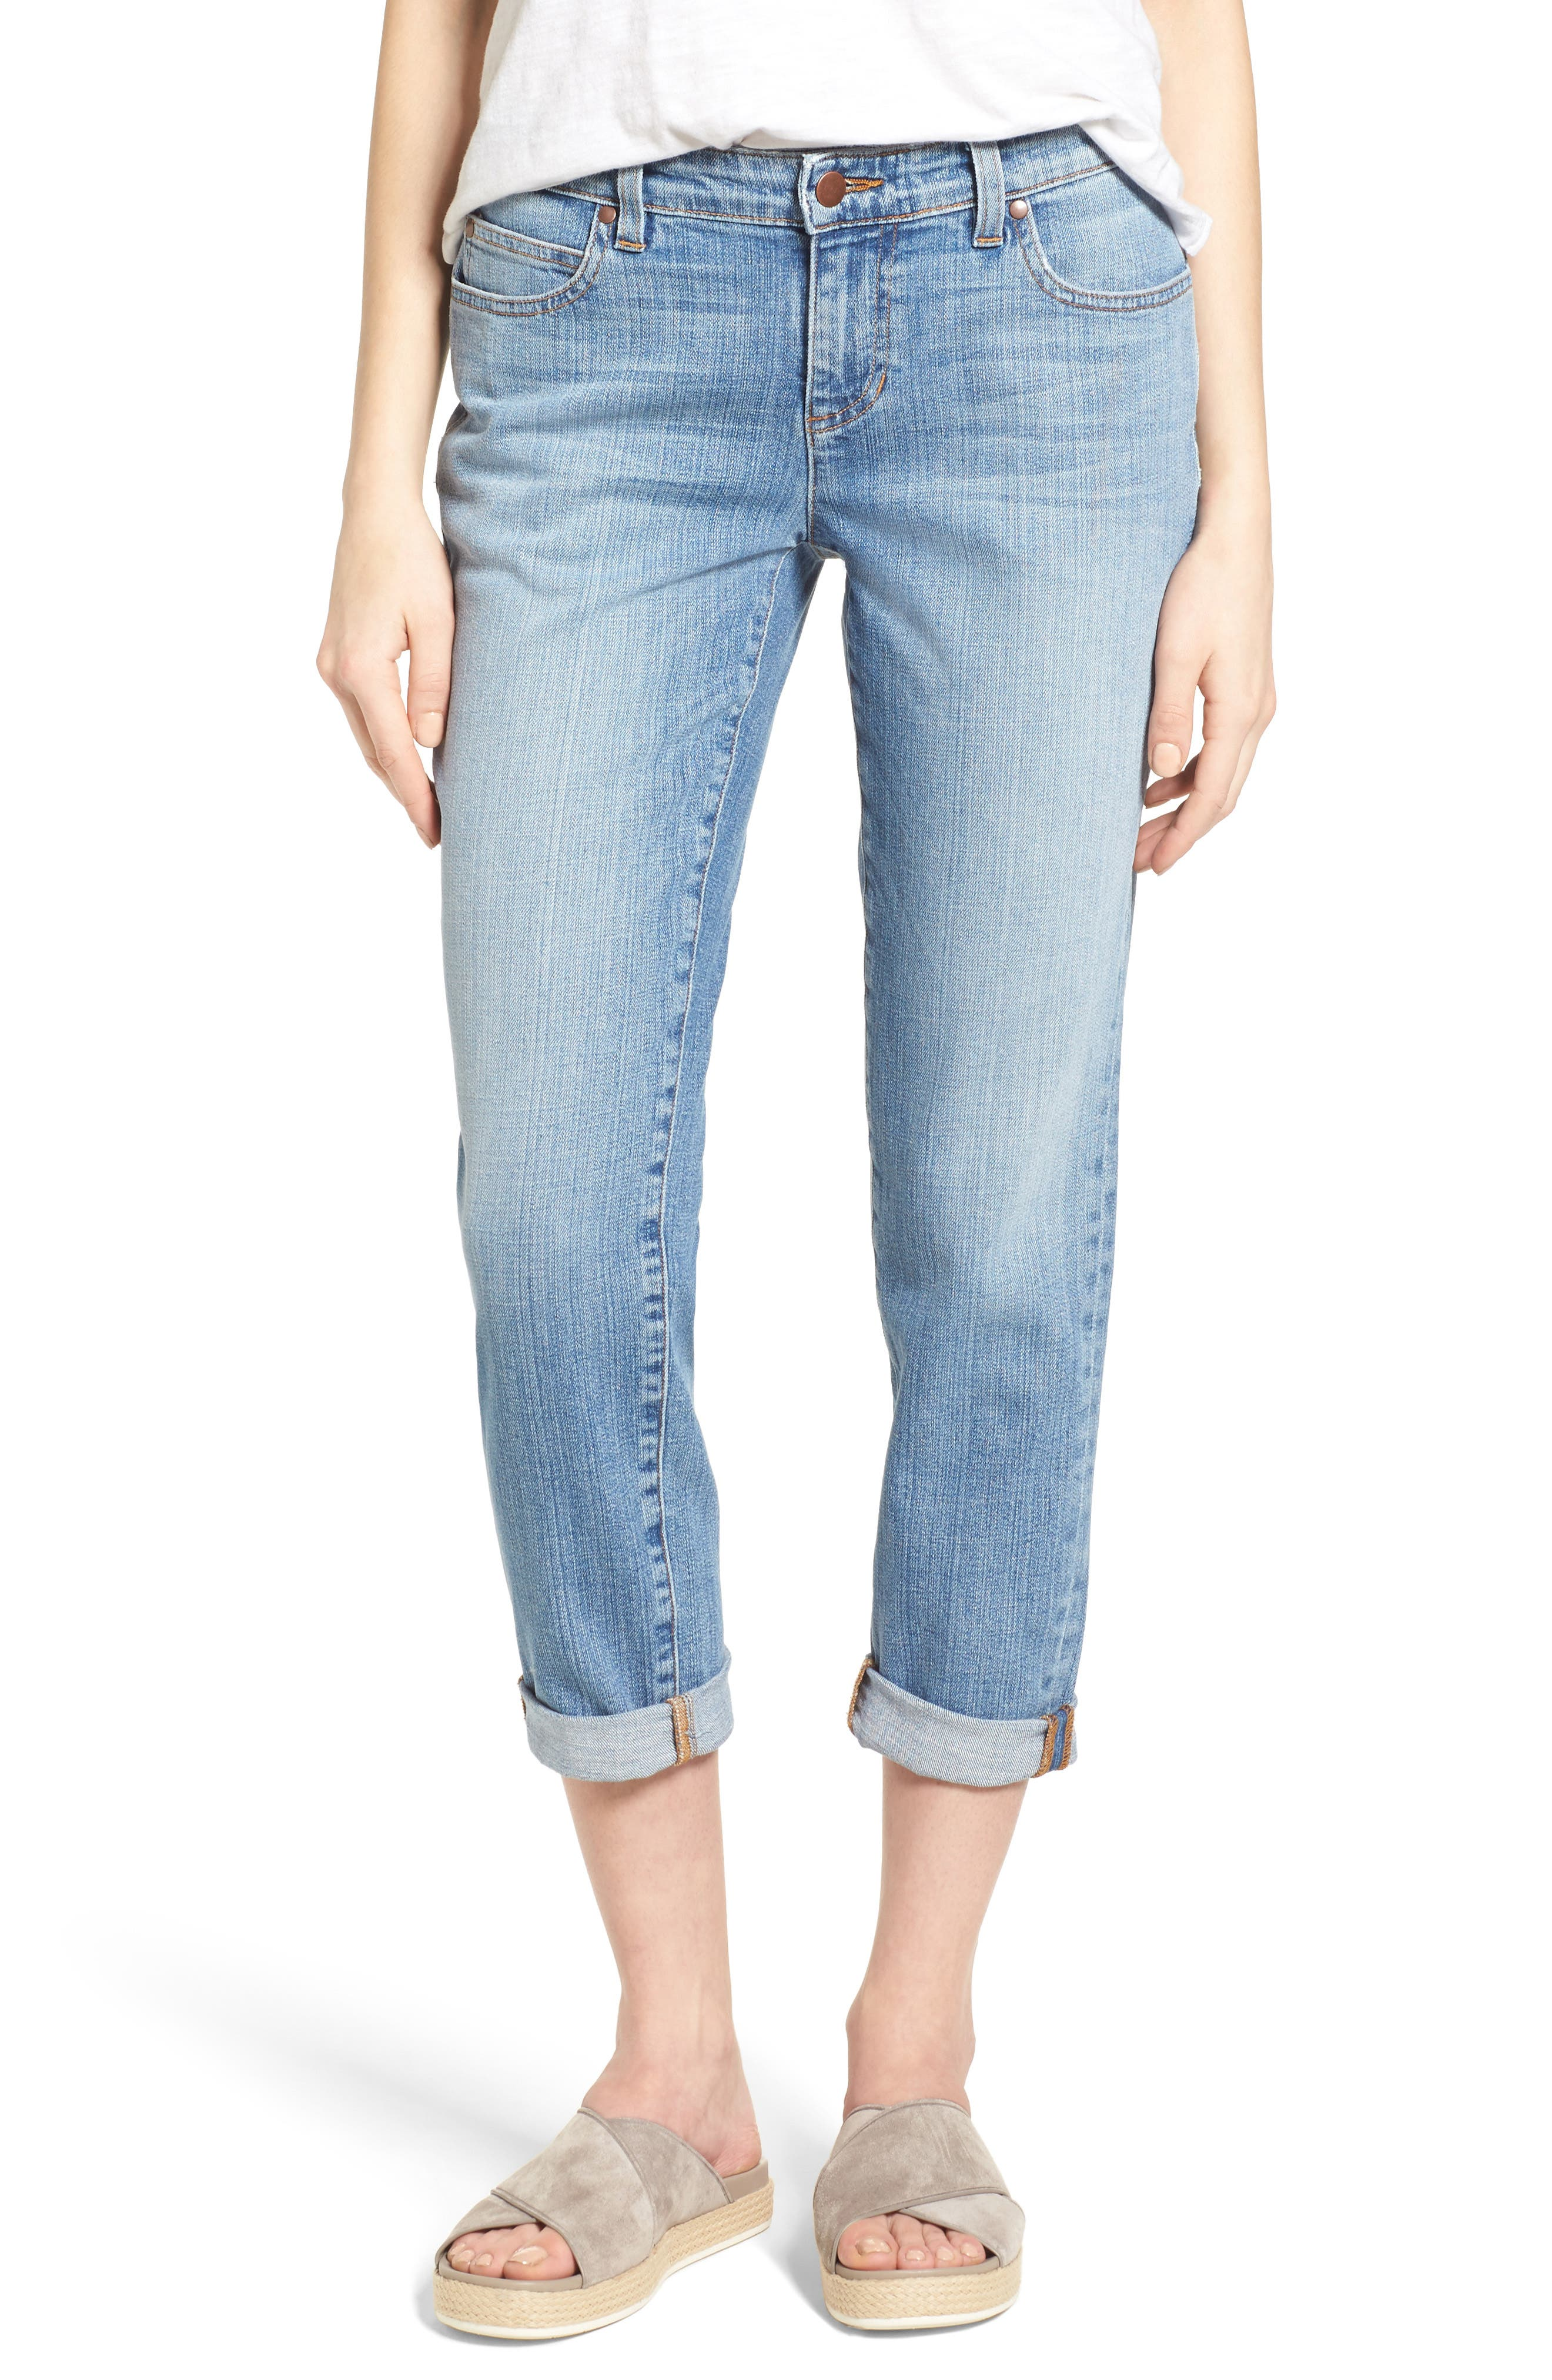 Alternate Image 1 Selected - Eileen Fisher Organic Cotton Boyfriend Jeans (Online Only) (Regular & Petite)